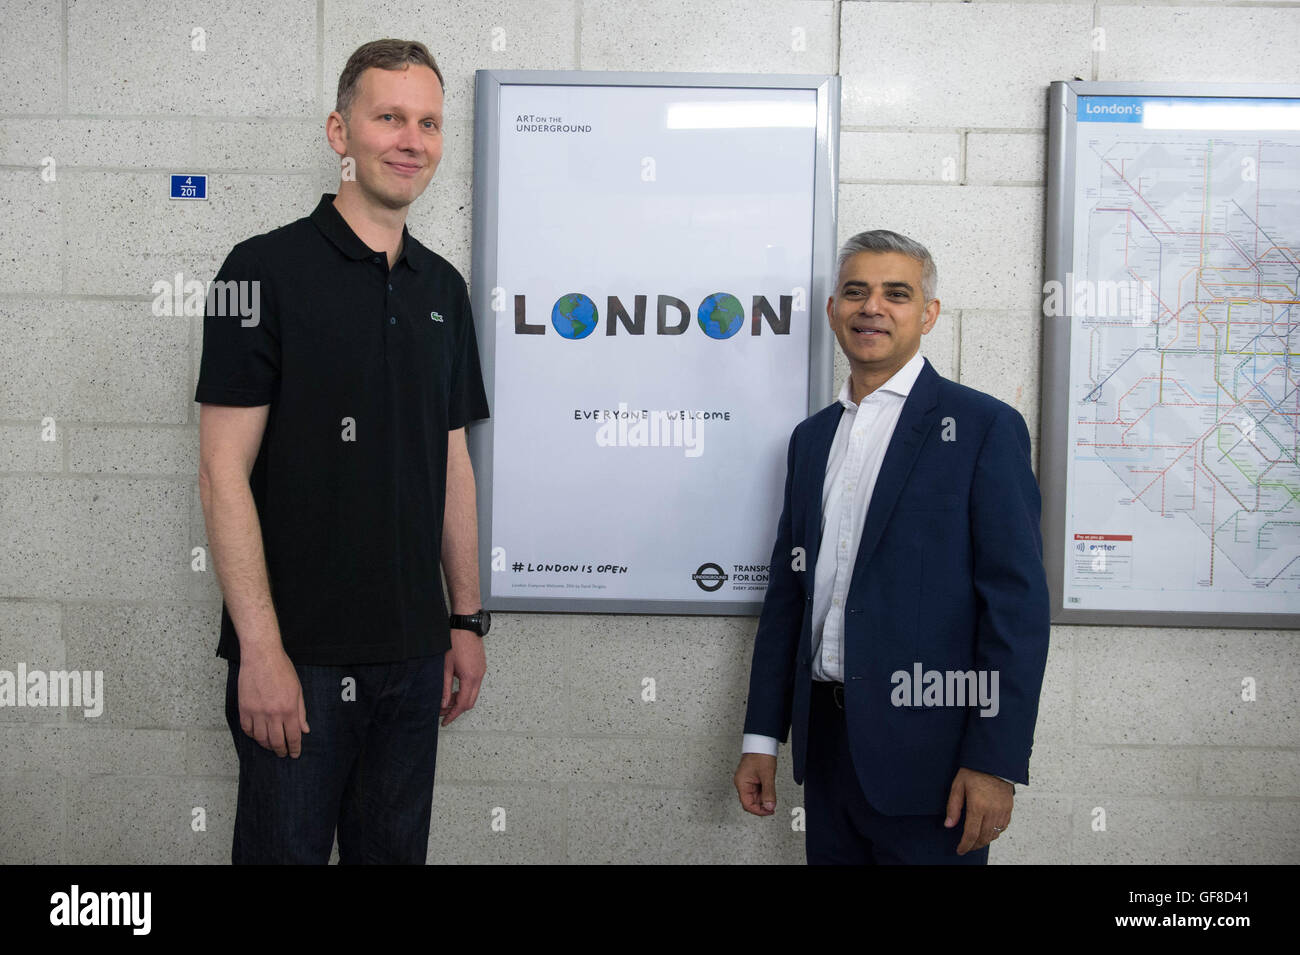 London Mayor Sadiq Khan unveils a new poster by artist David Shrigley (left) at Southwark Underground Station which - Stock Image